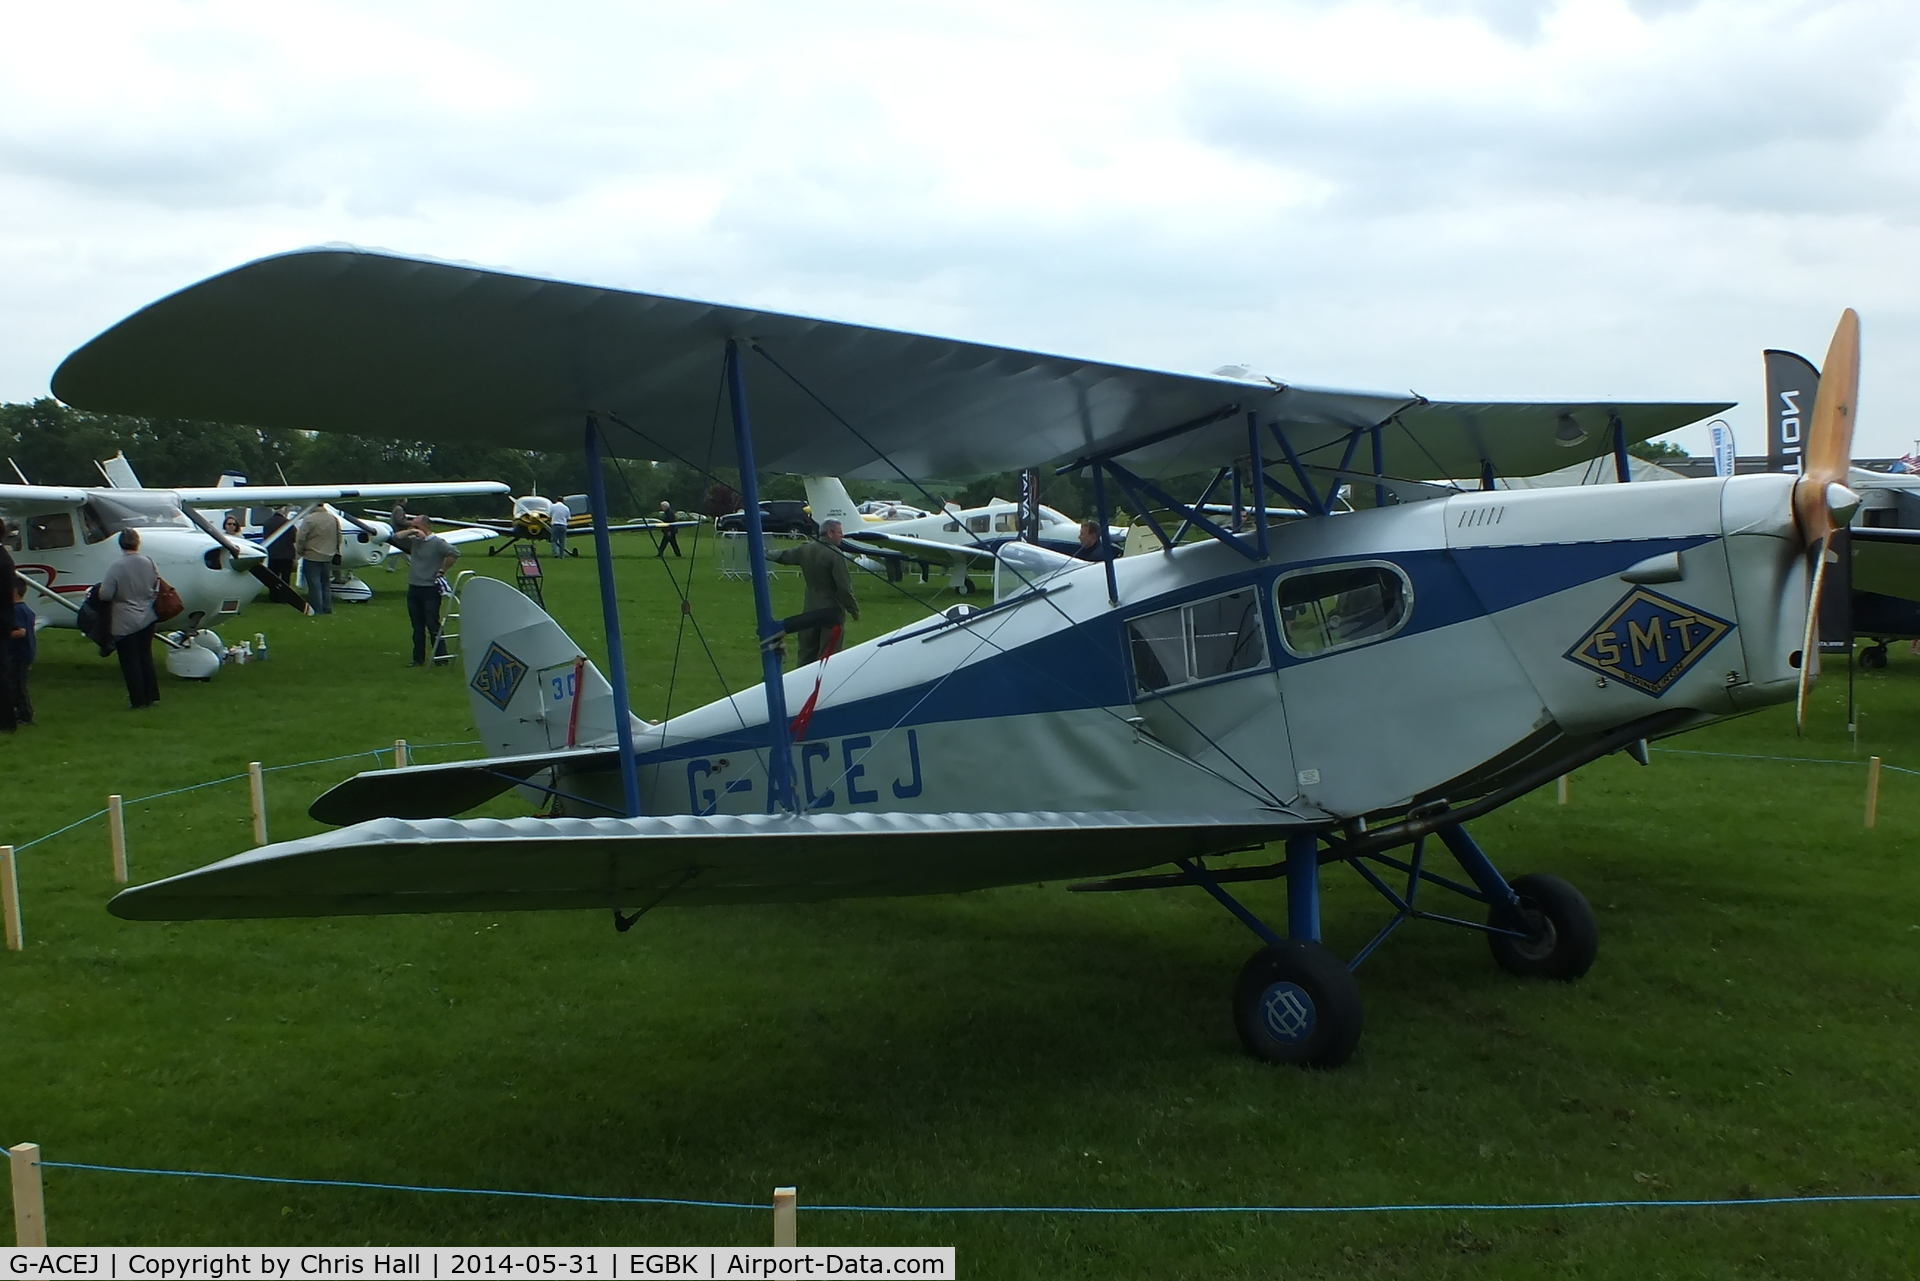 G-ACEJ, 1933 De Havilland DH.83 Fox Moth C/N 4069, at AeroExpo 2014